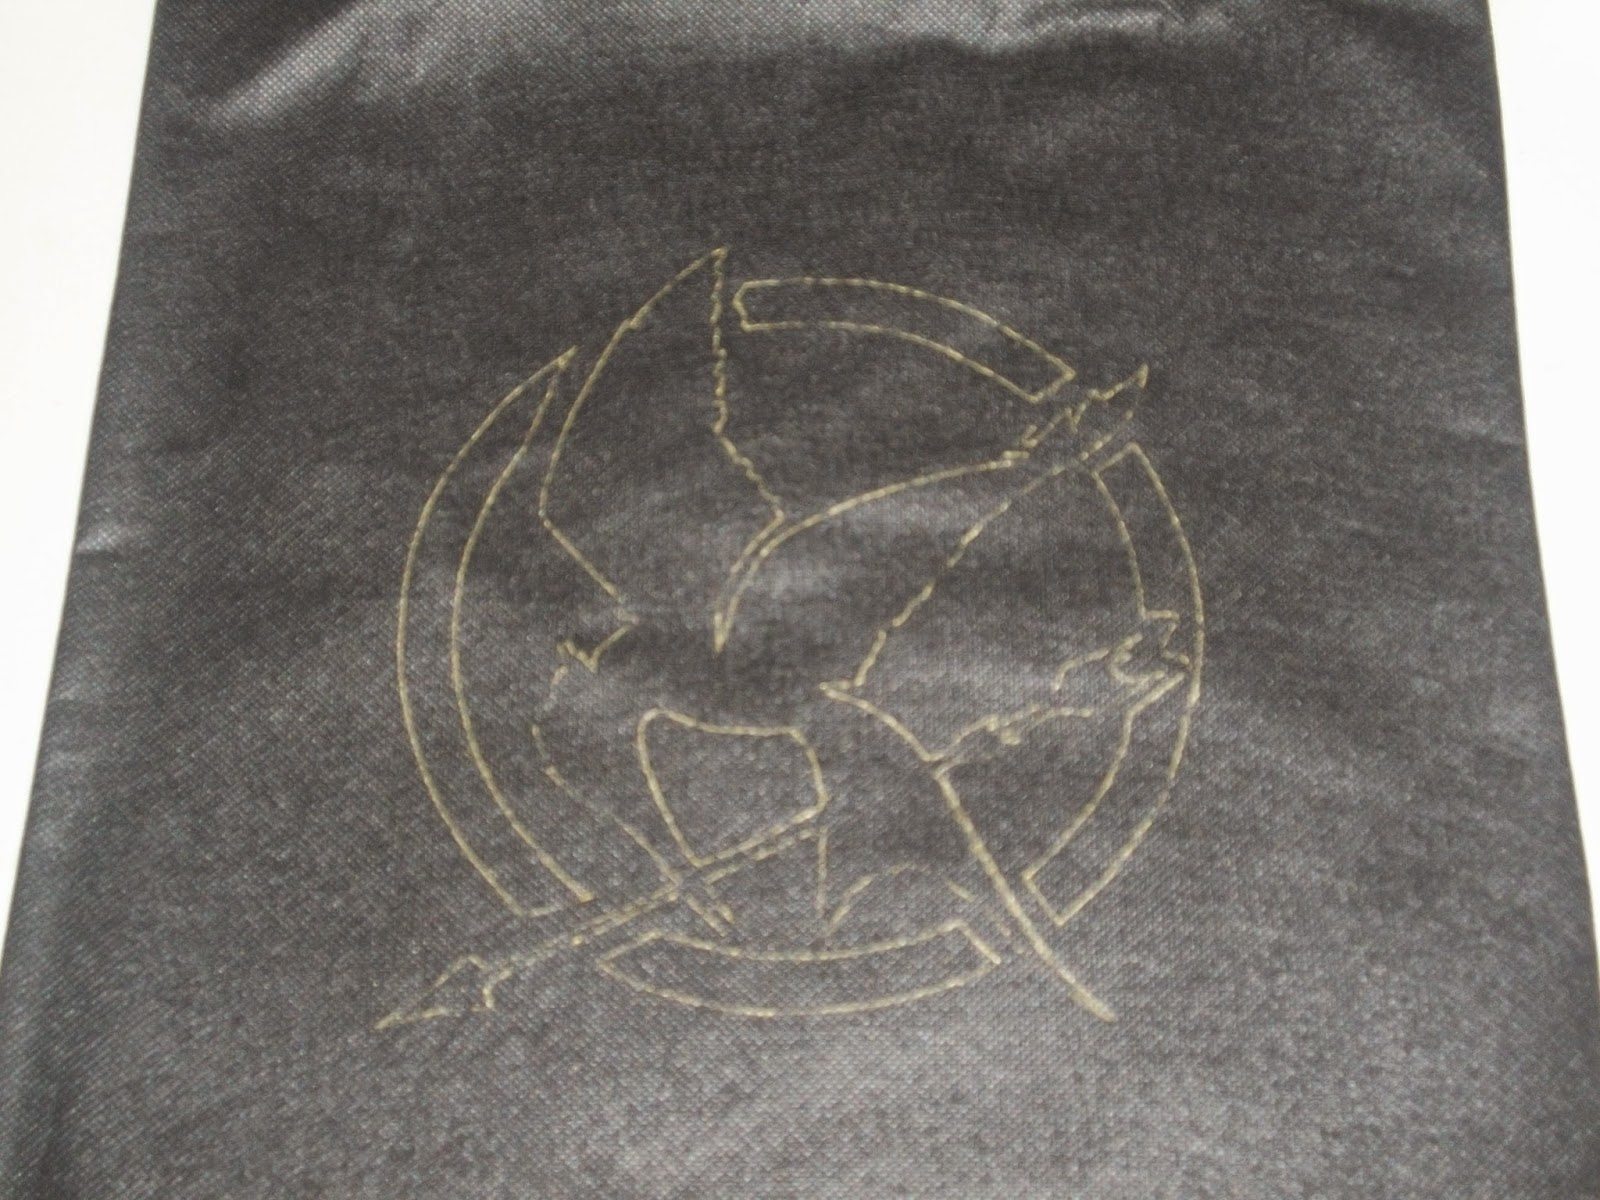 Mockingjay traced onto tote bag